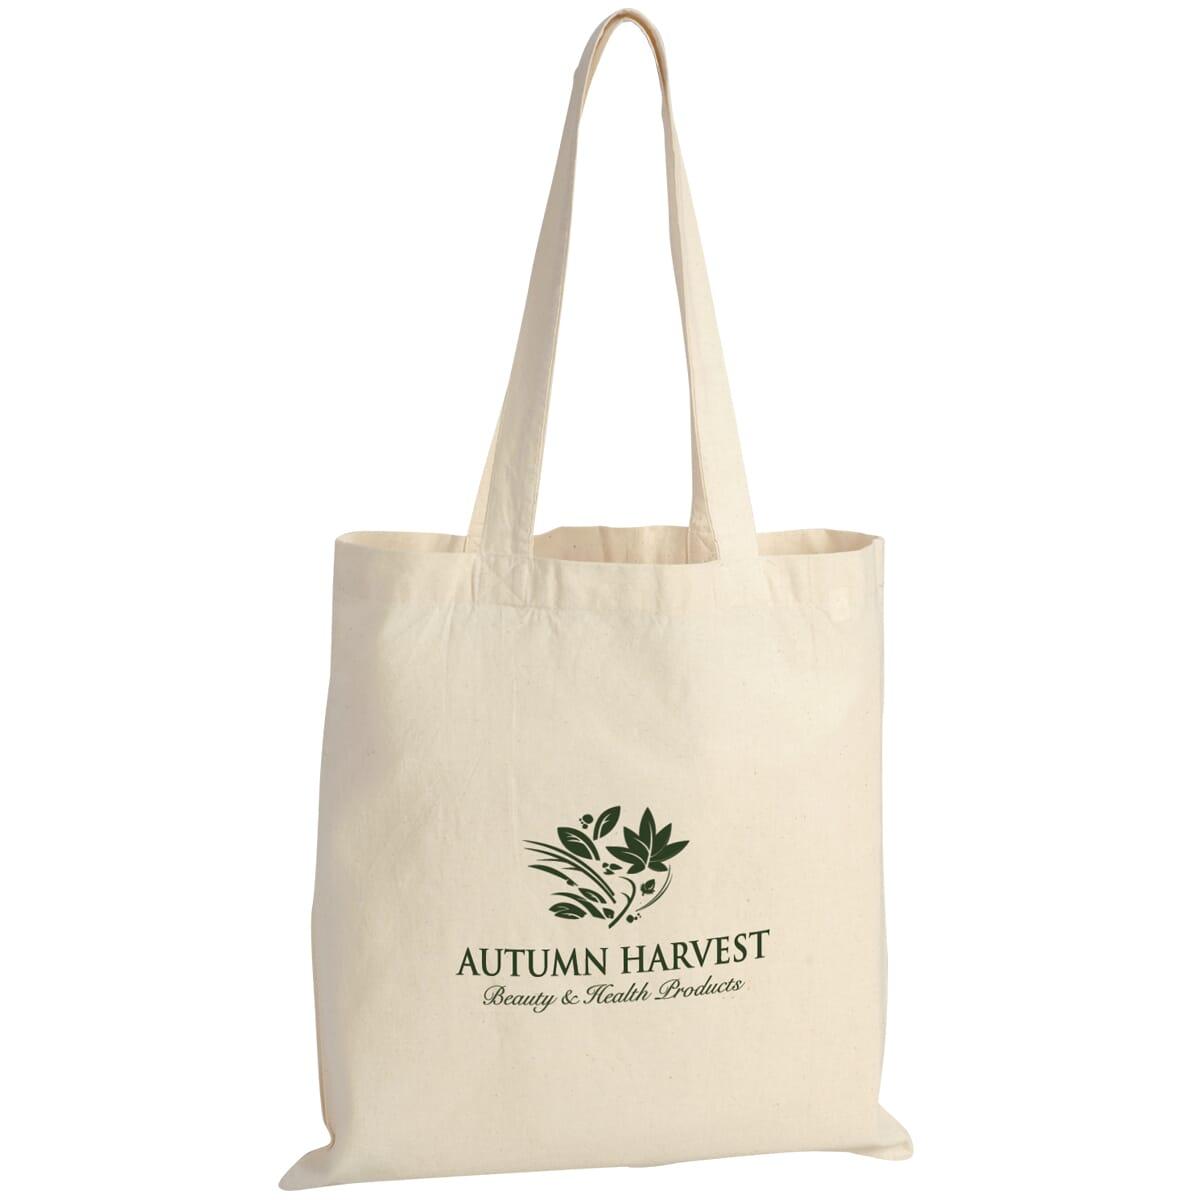 Afforable natural color tote bag